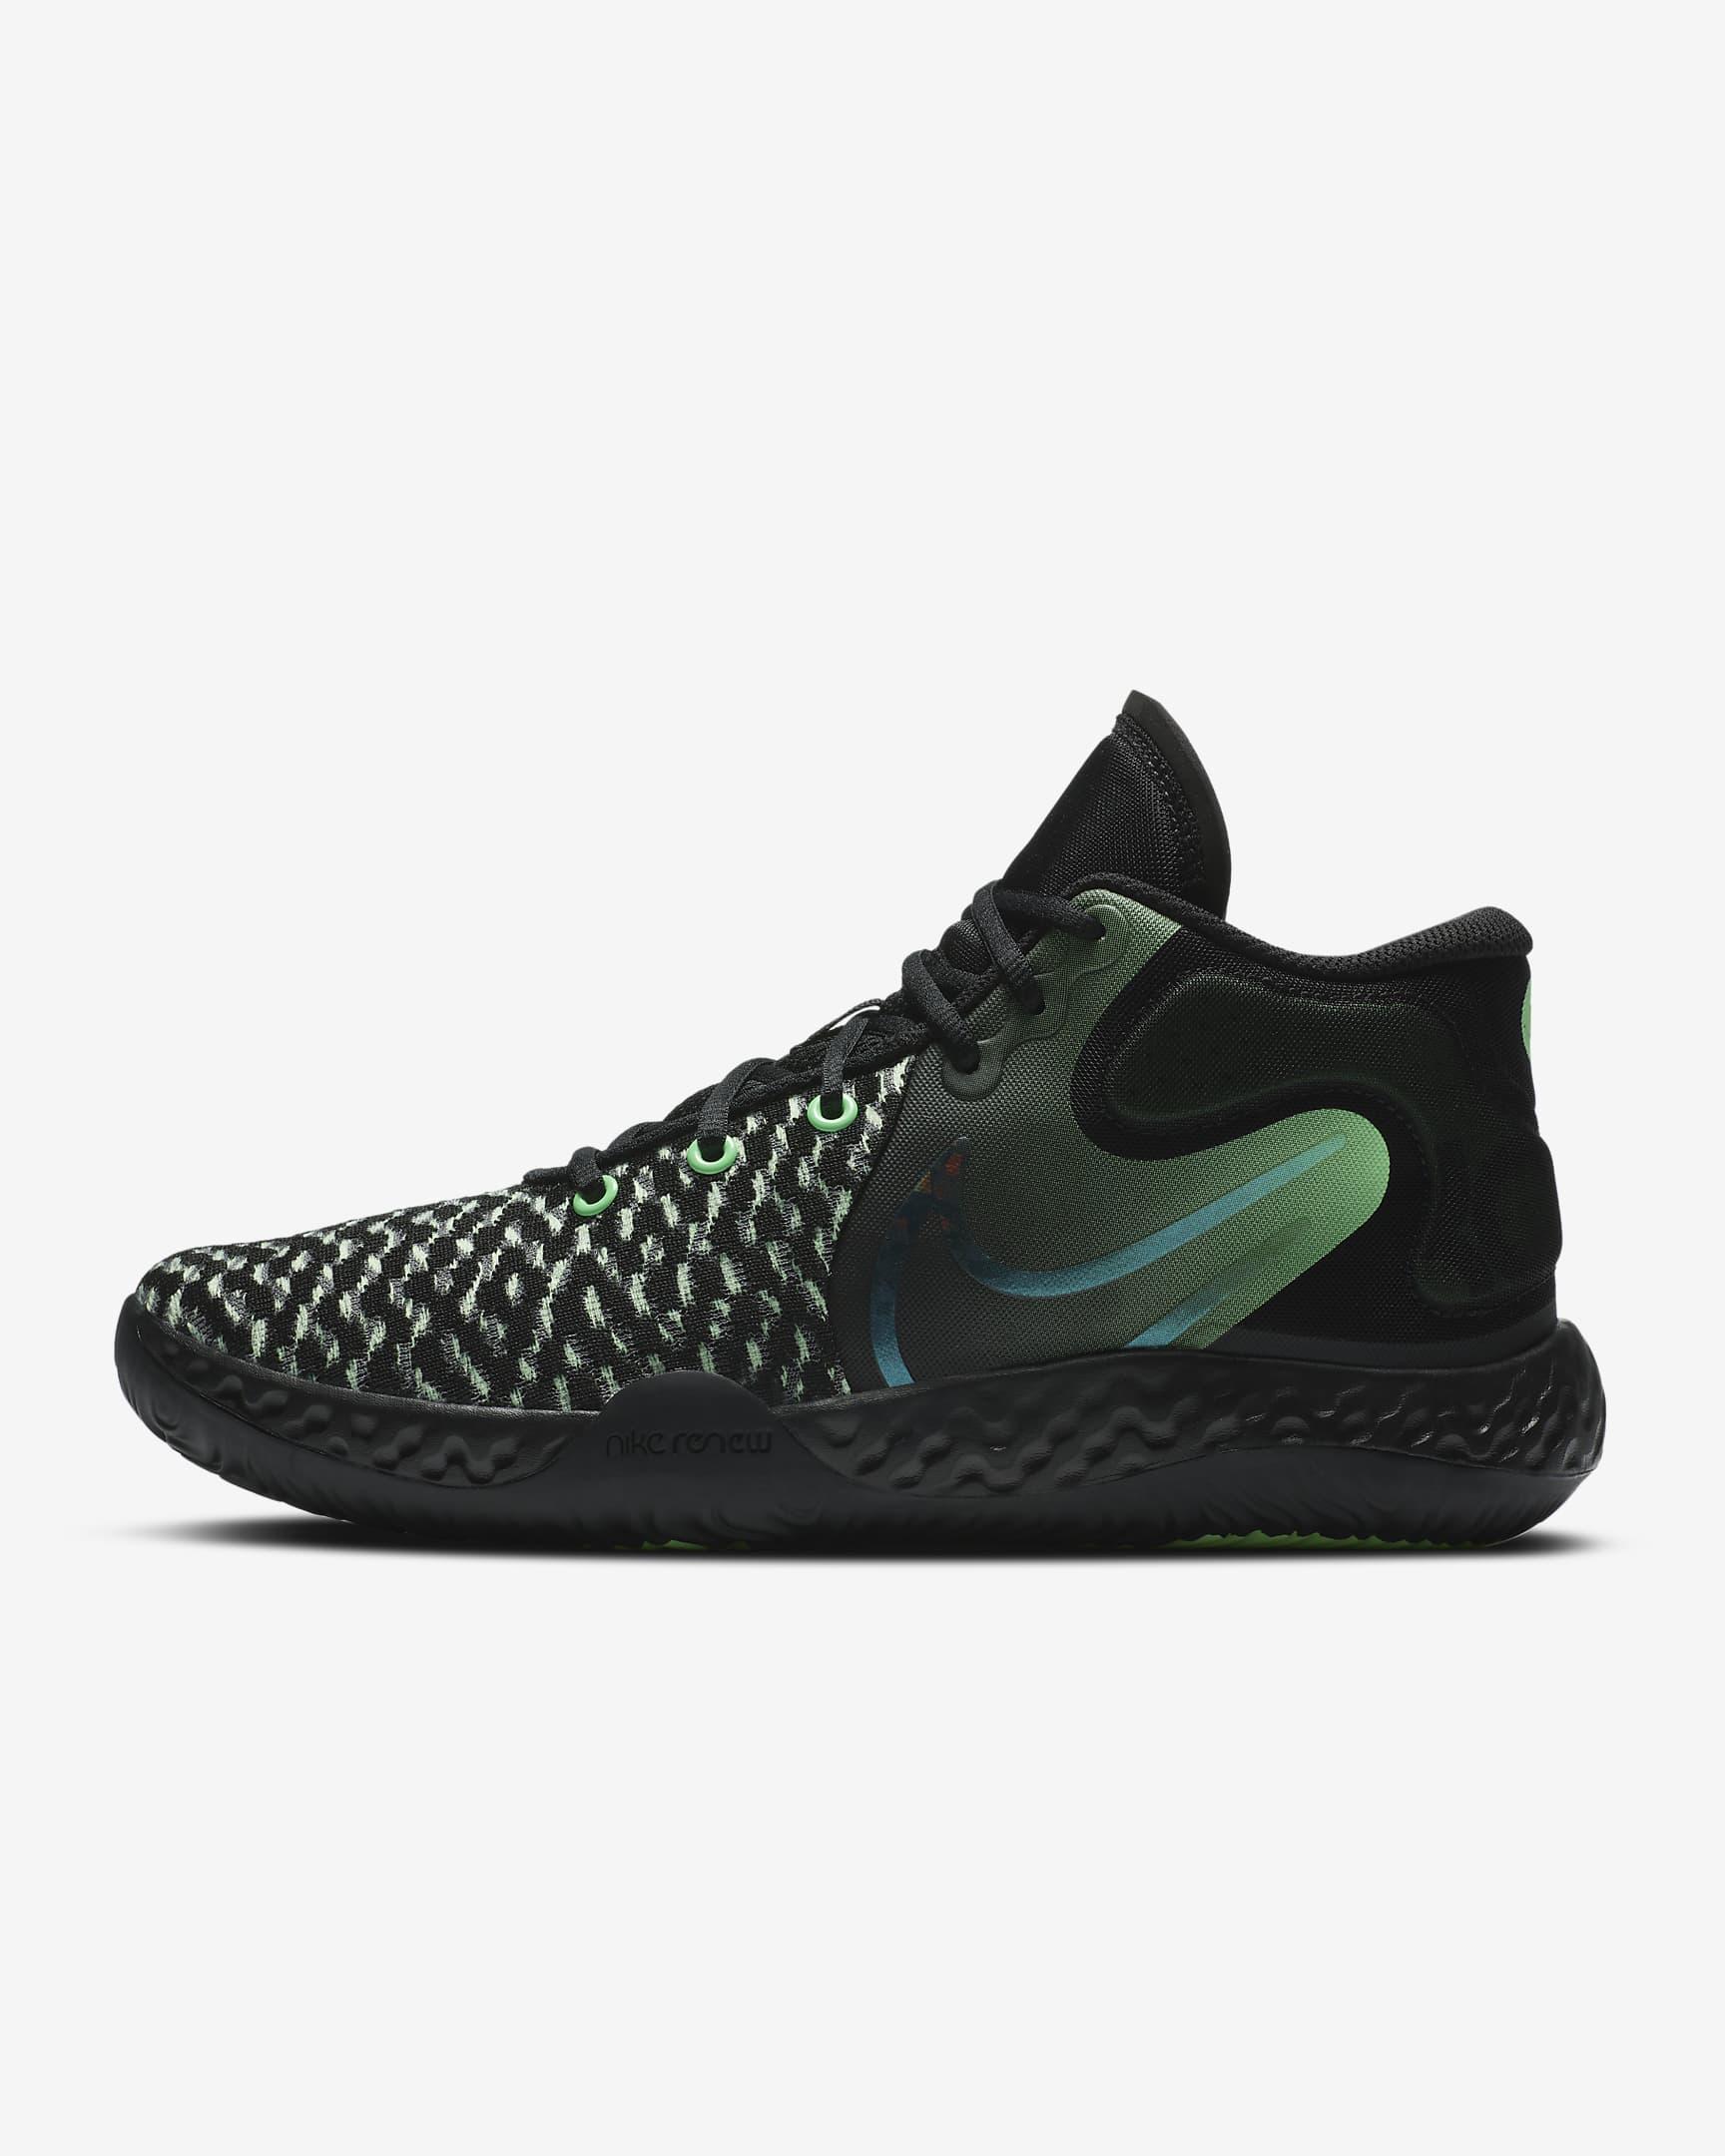 Nike Mens KD Trey 5 VIII Basketball Shoes